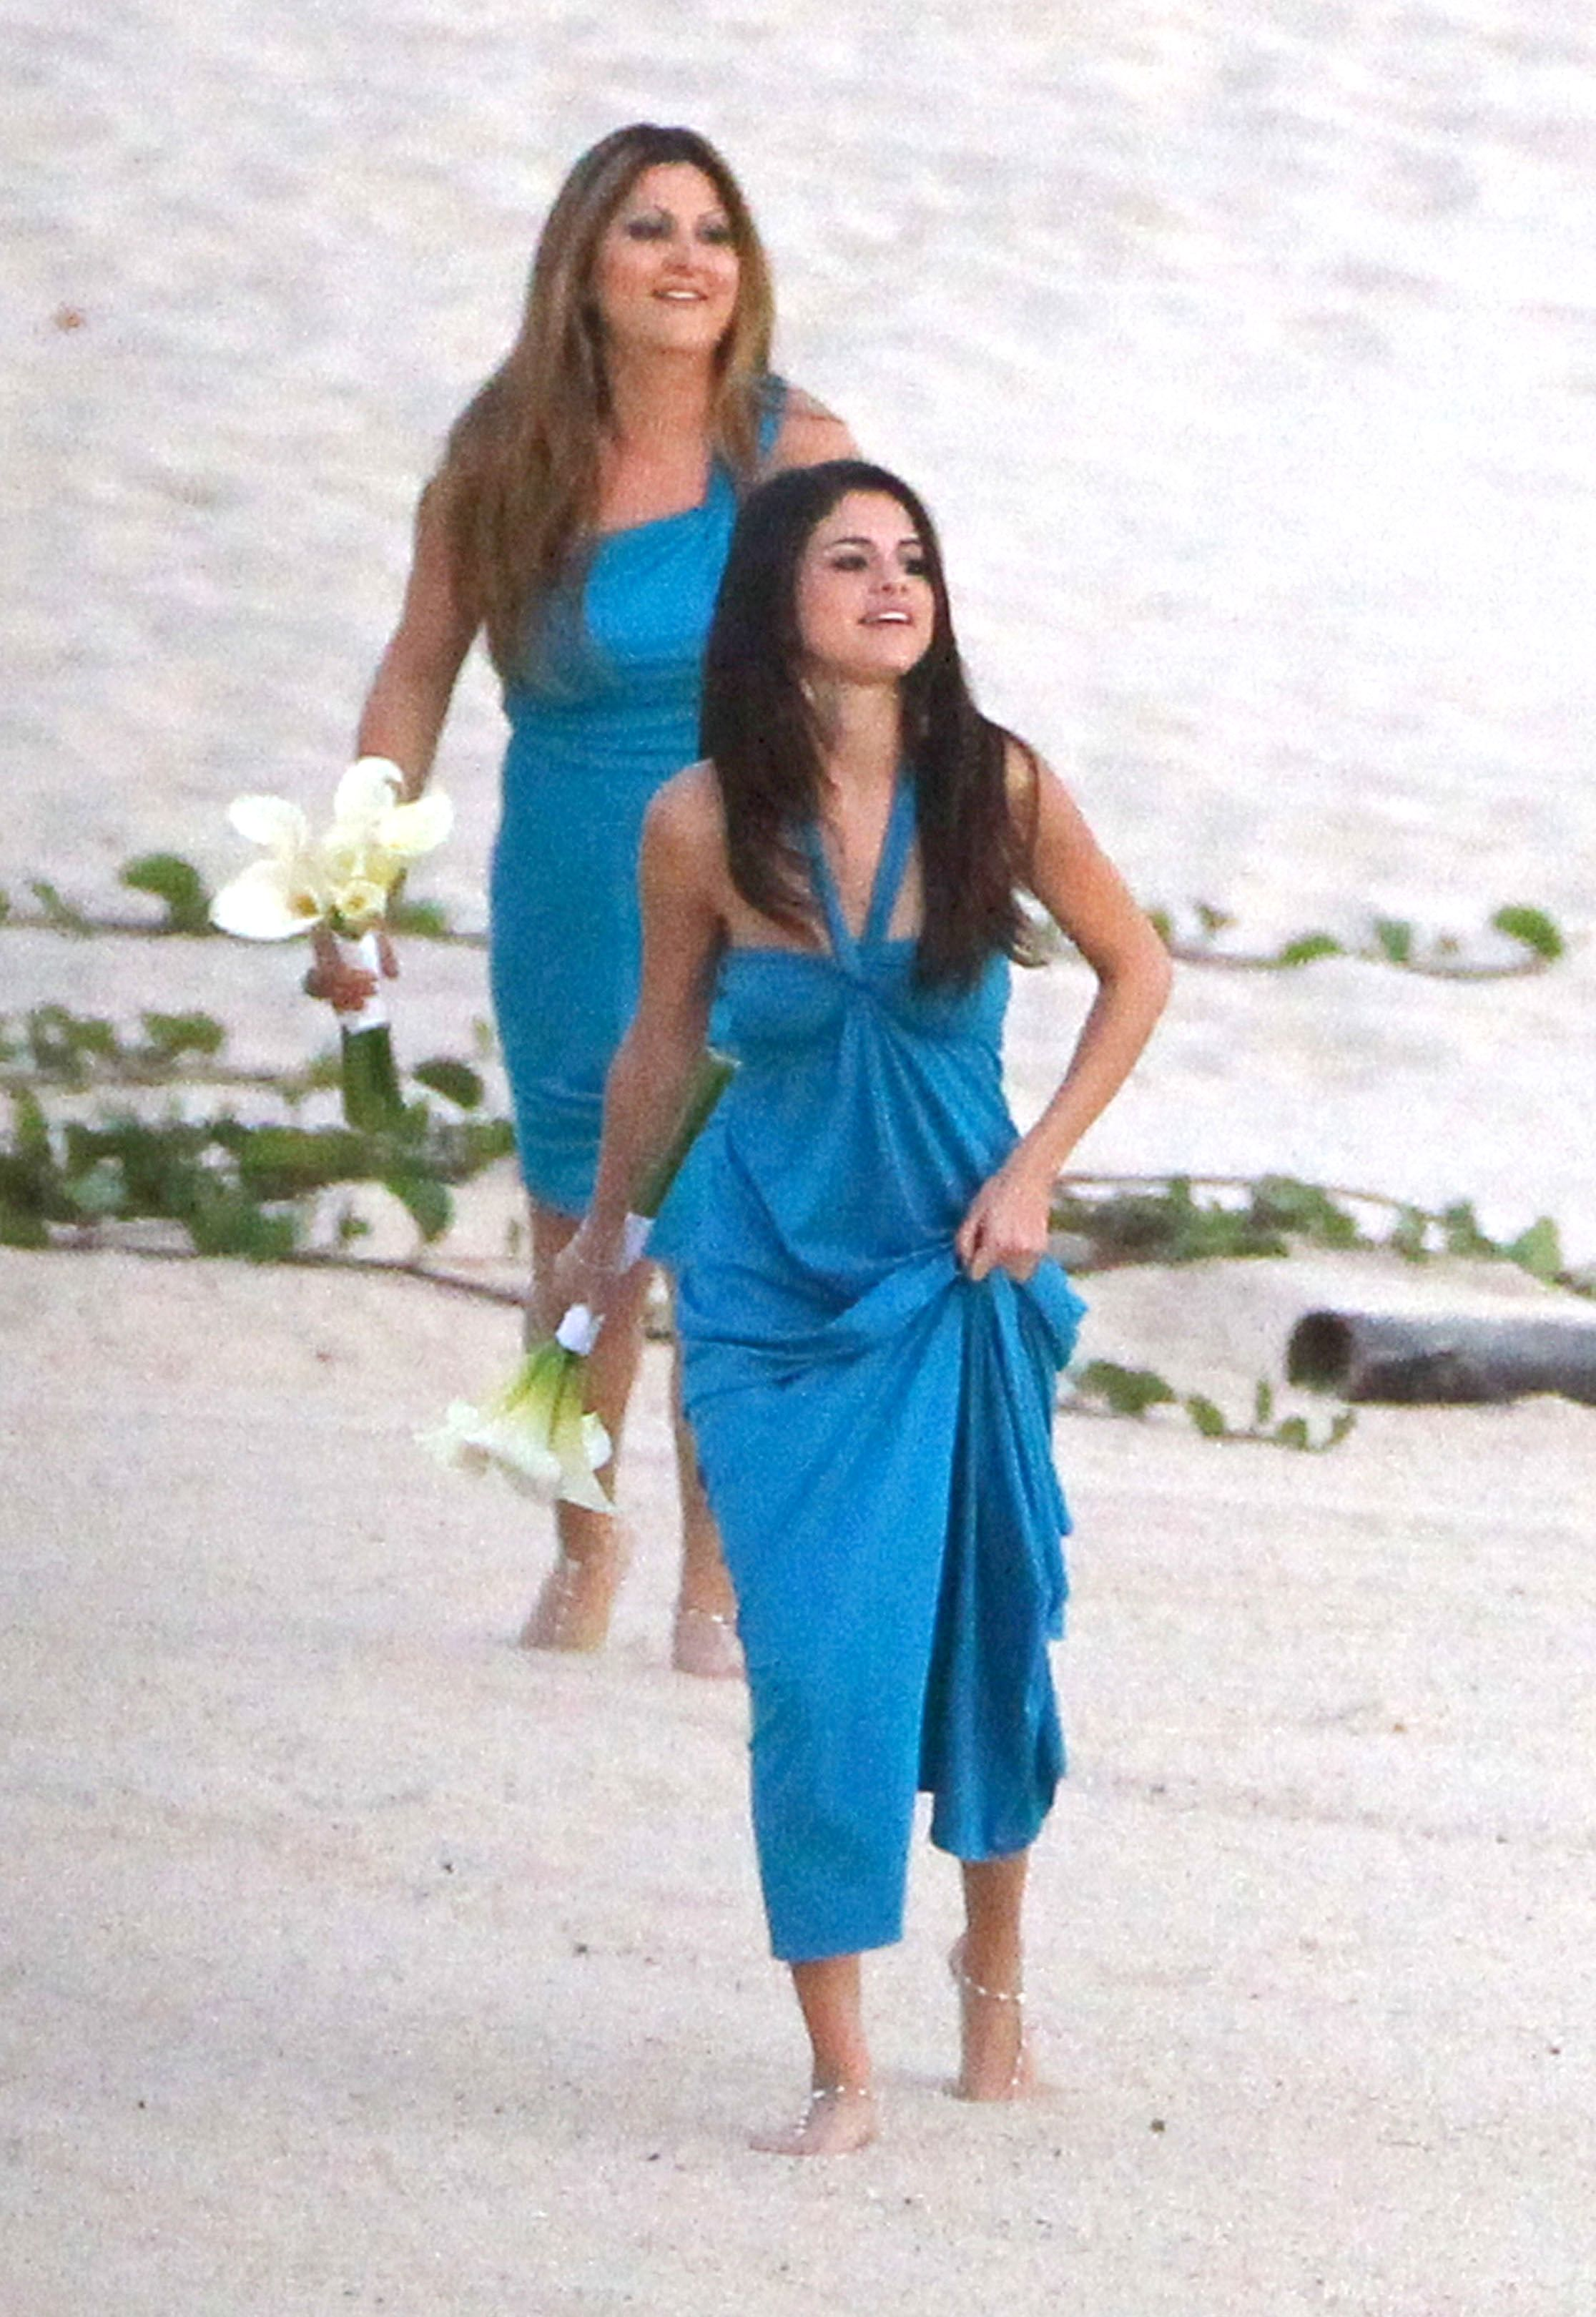 Celebrity Bridesmaid Photos - Hollywood Bridesmaid Pics